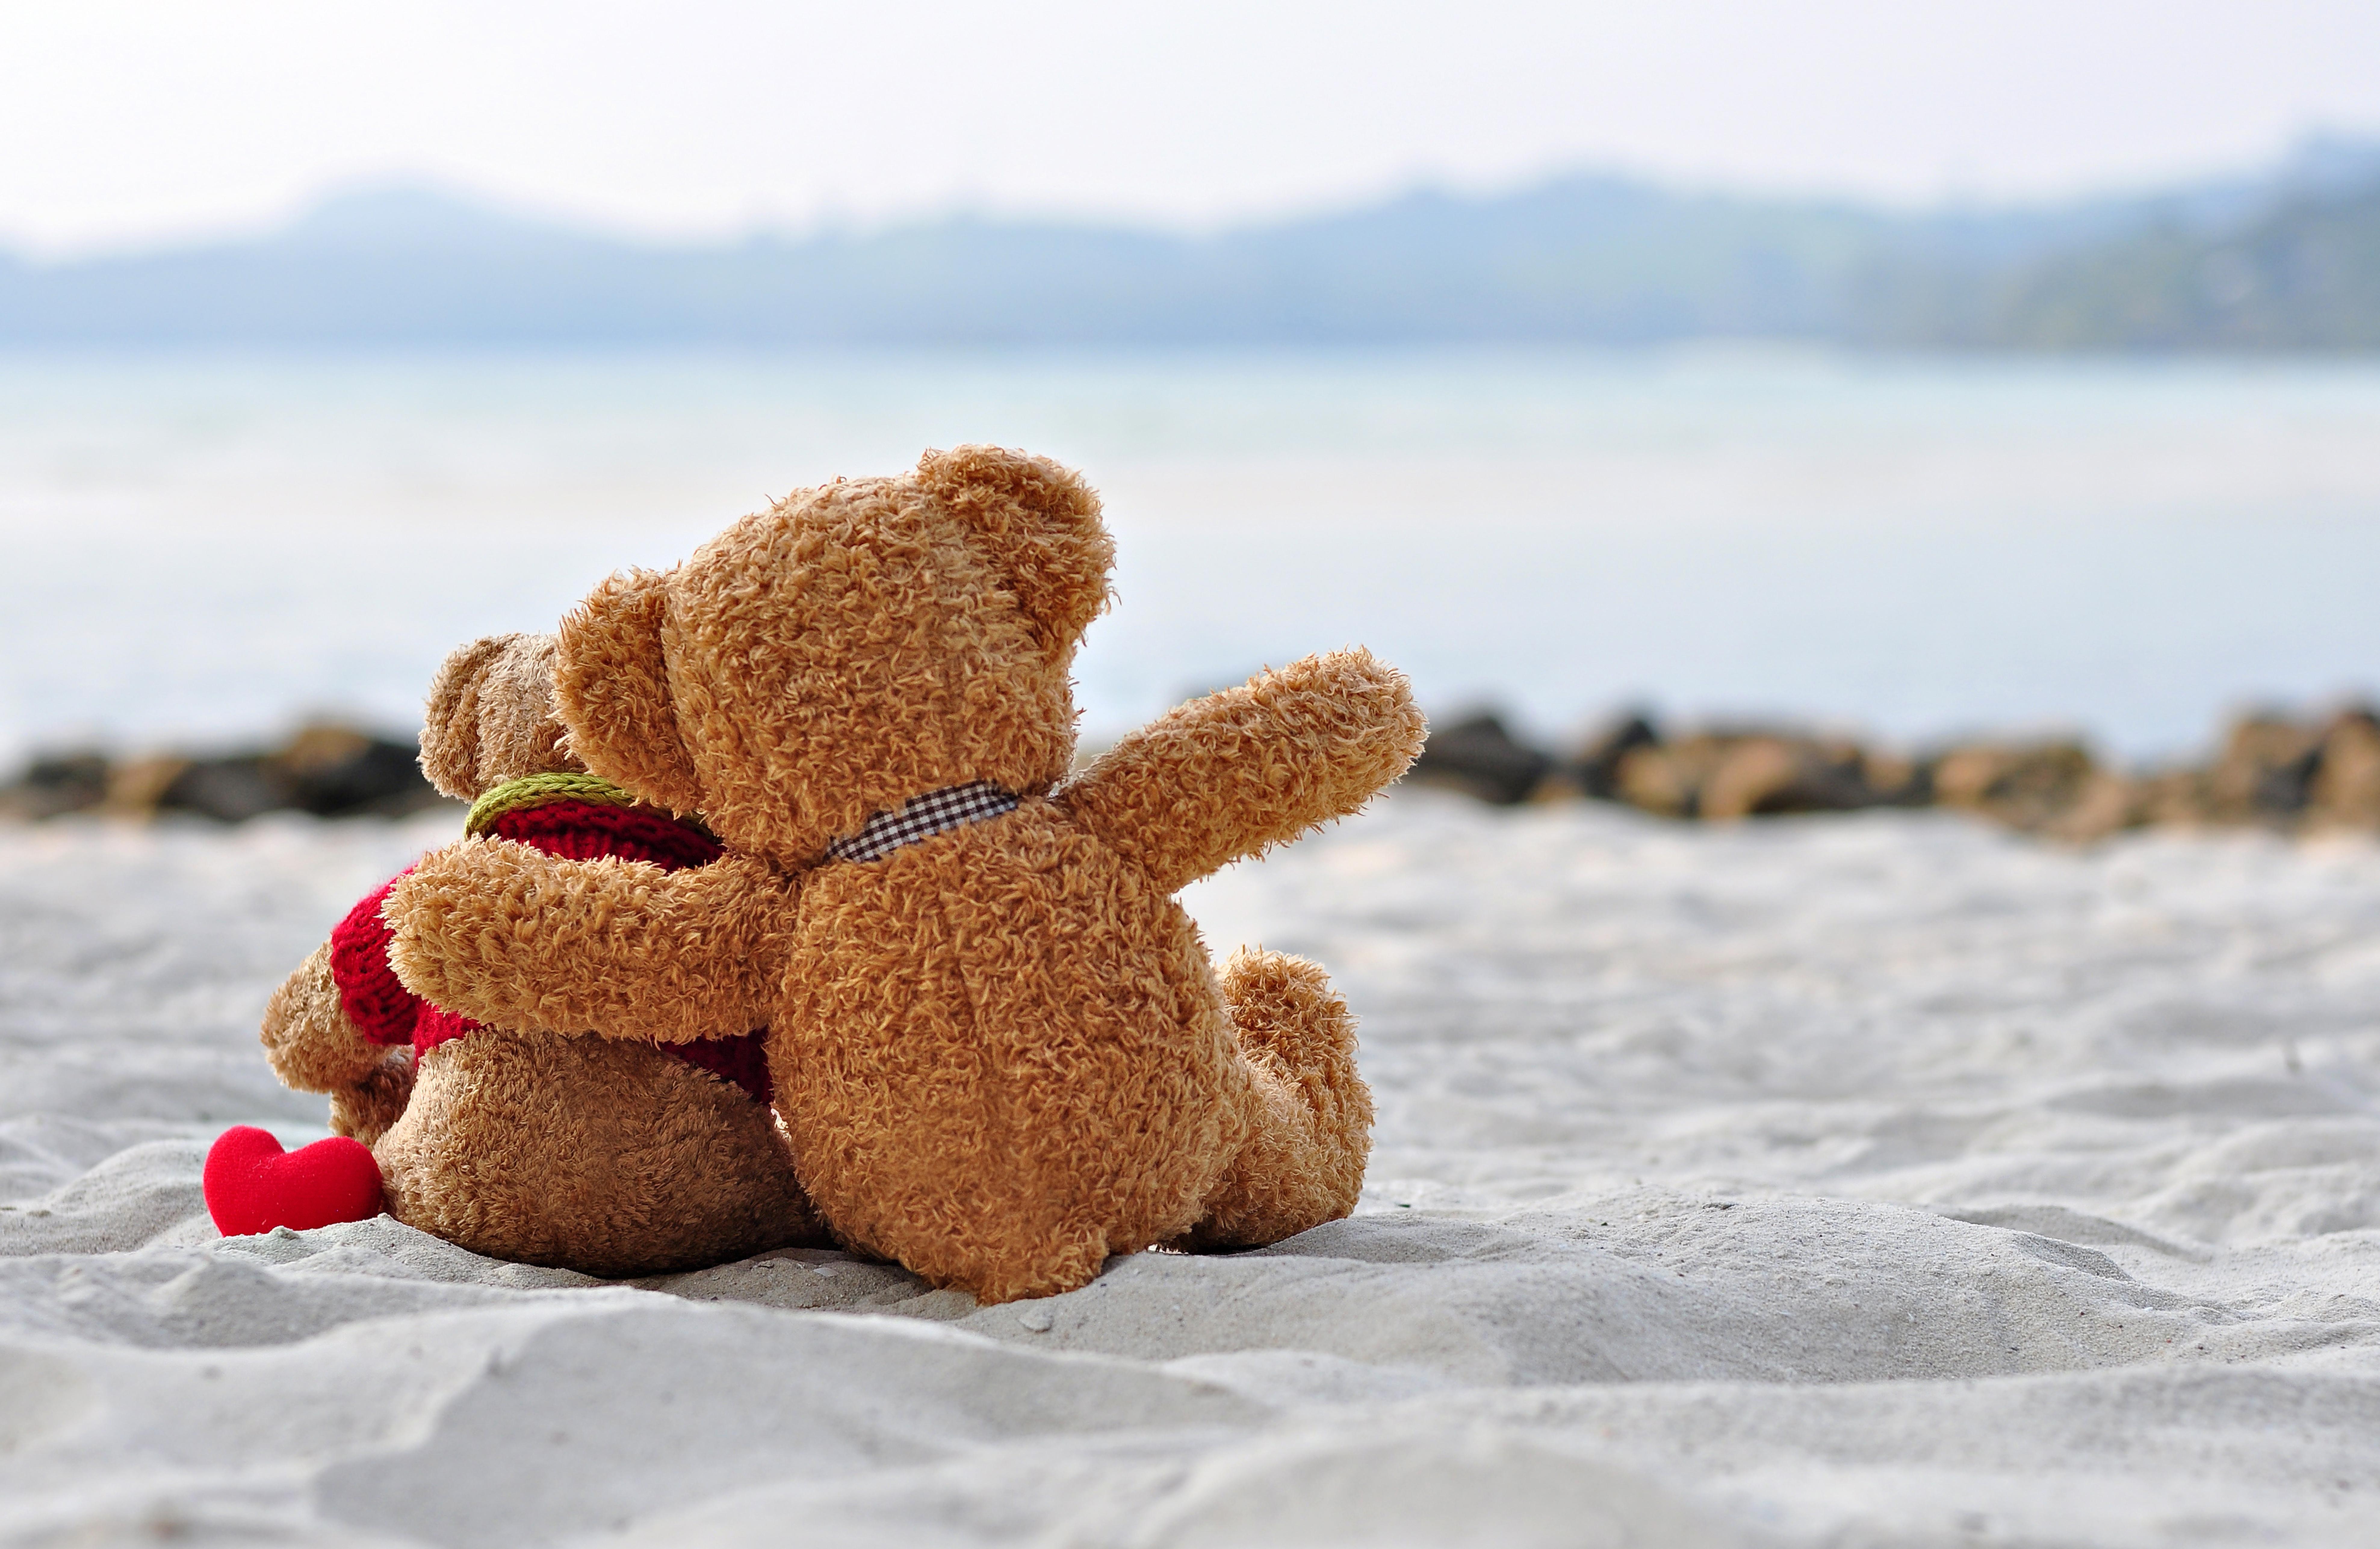 Teddy Bears Cuddling On The Beach 8k Ultra Hd Wallpaper Background